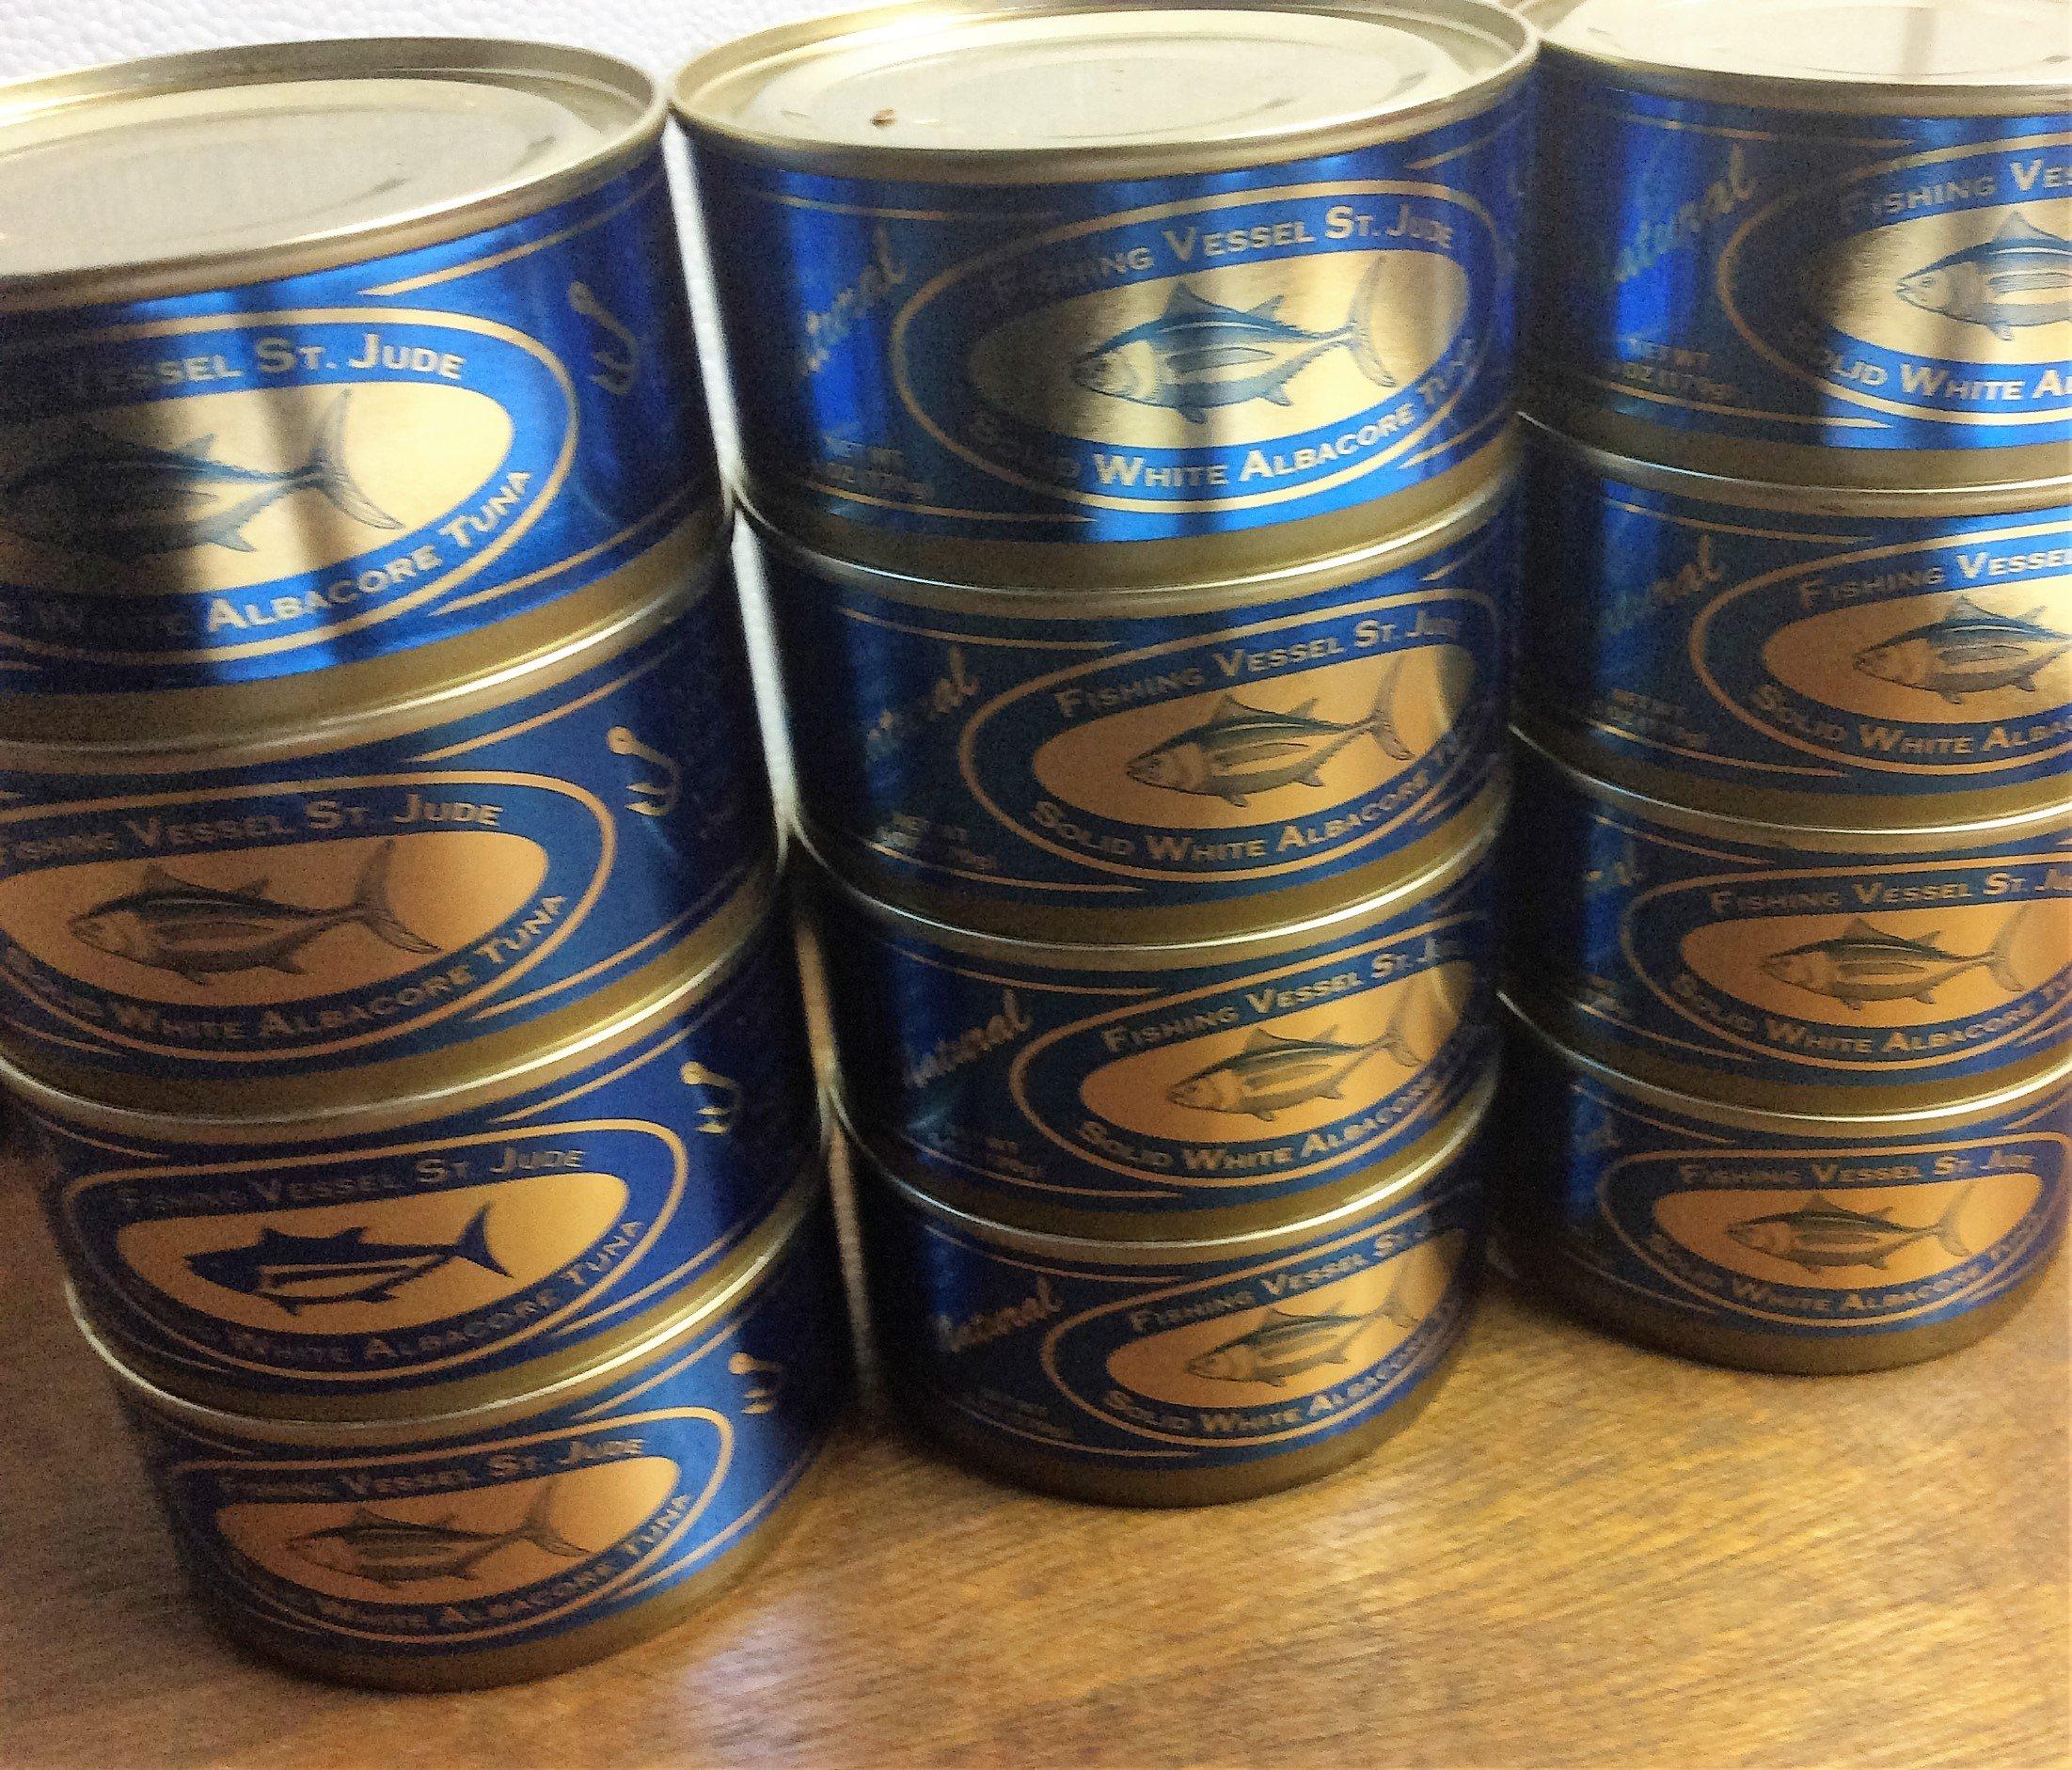 St. Jude No Salt Canned Tuna 12 6 oz. cans